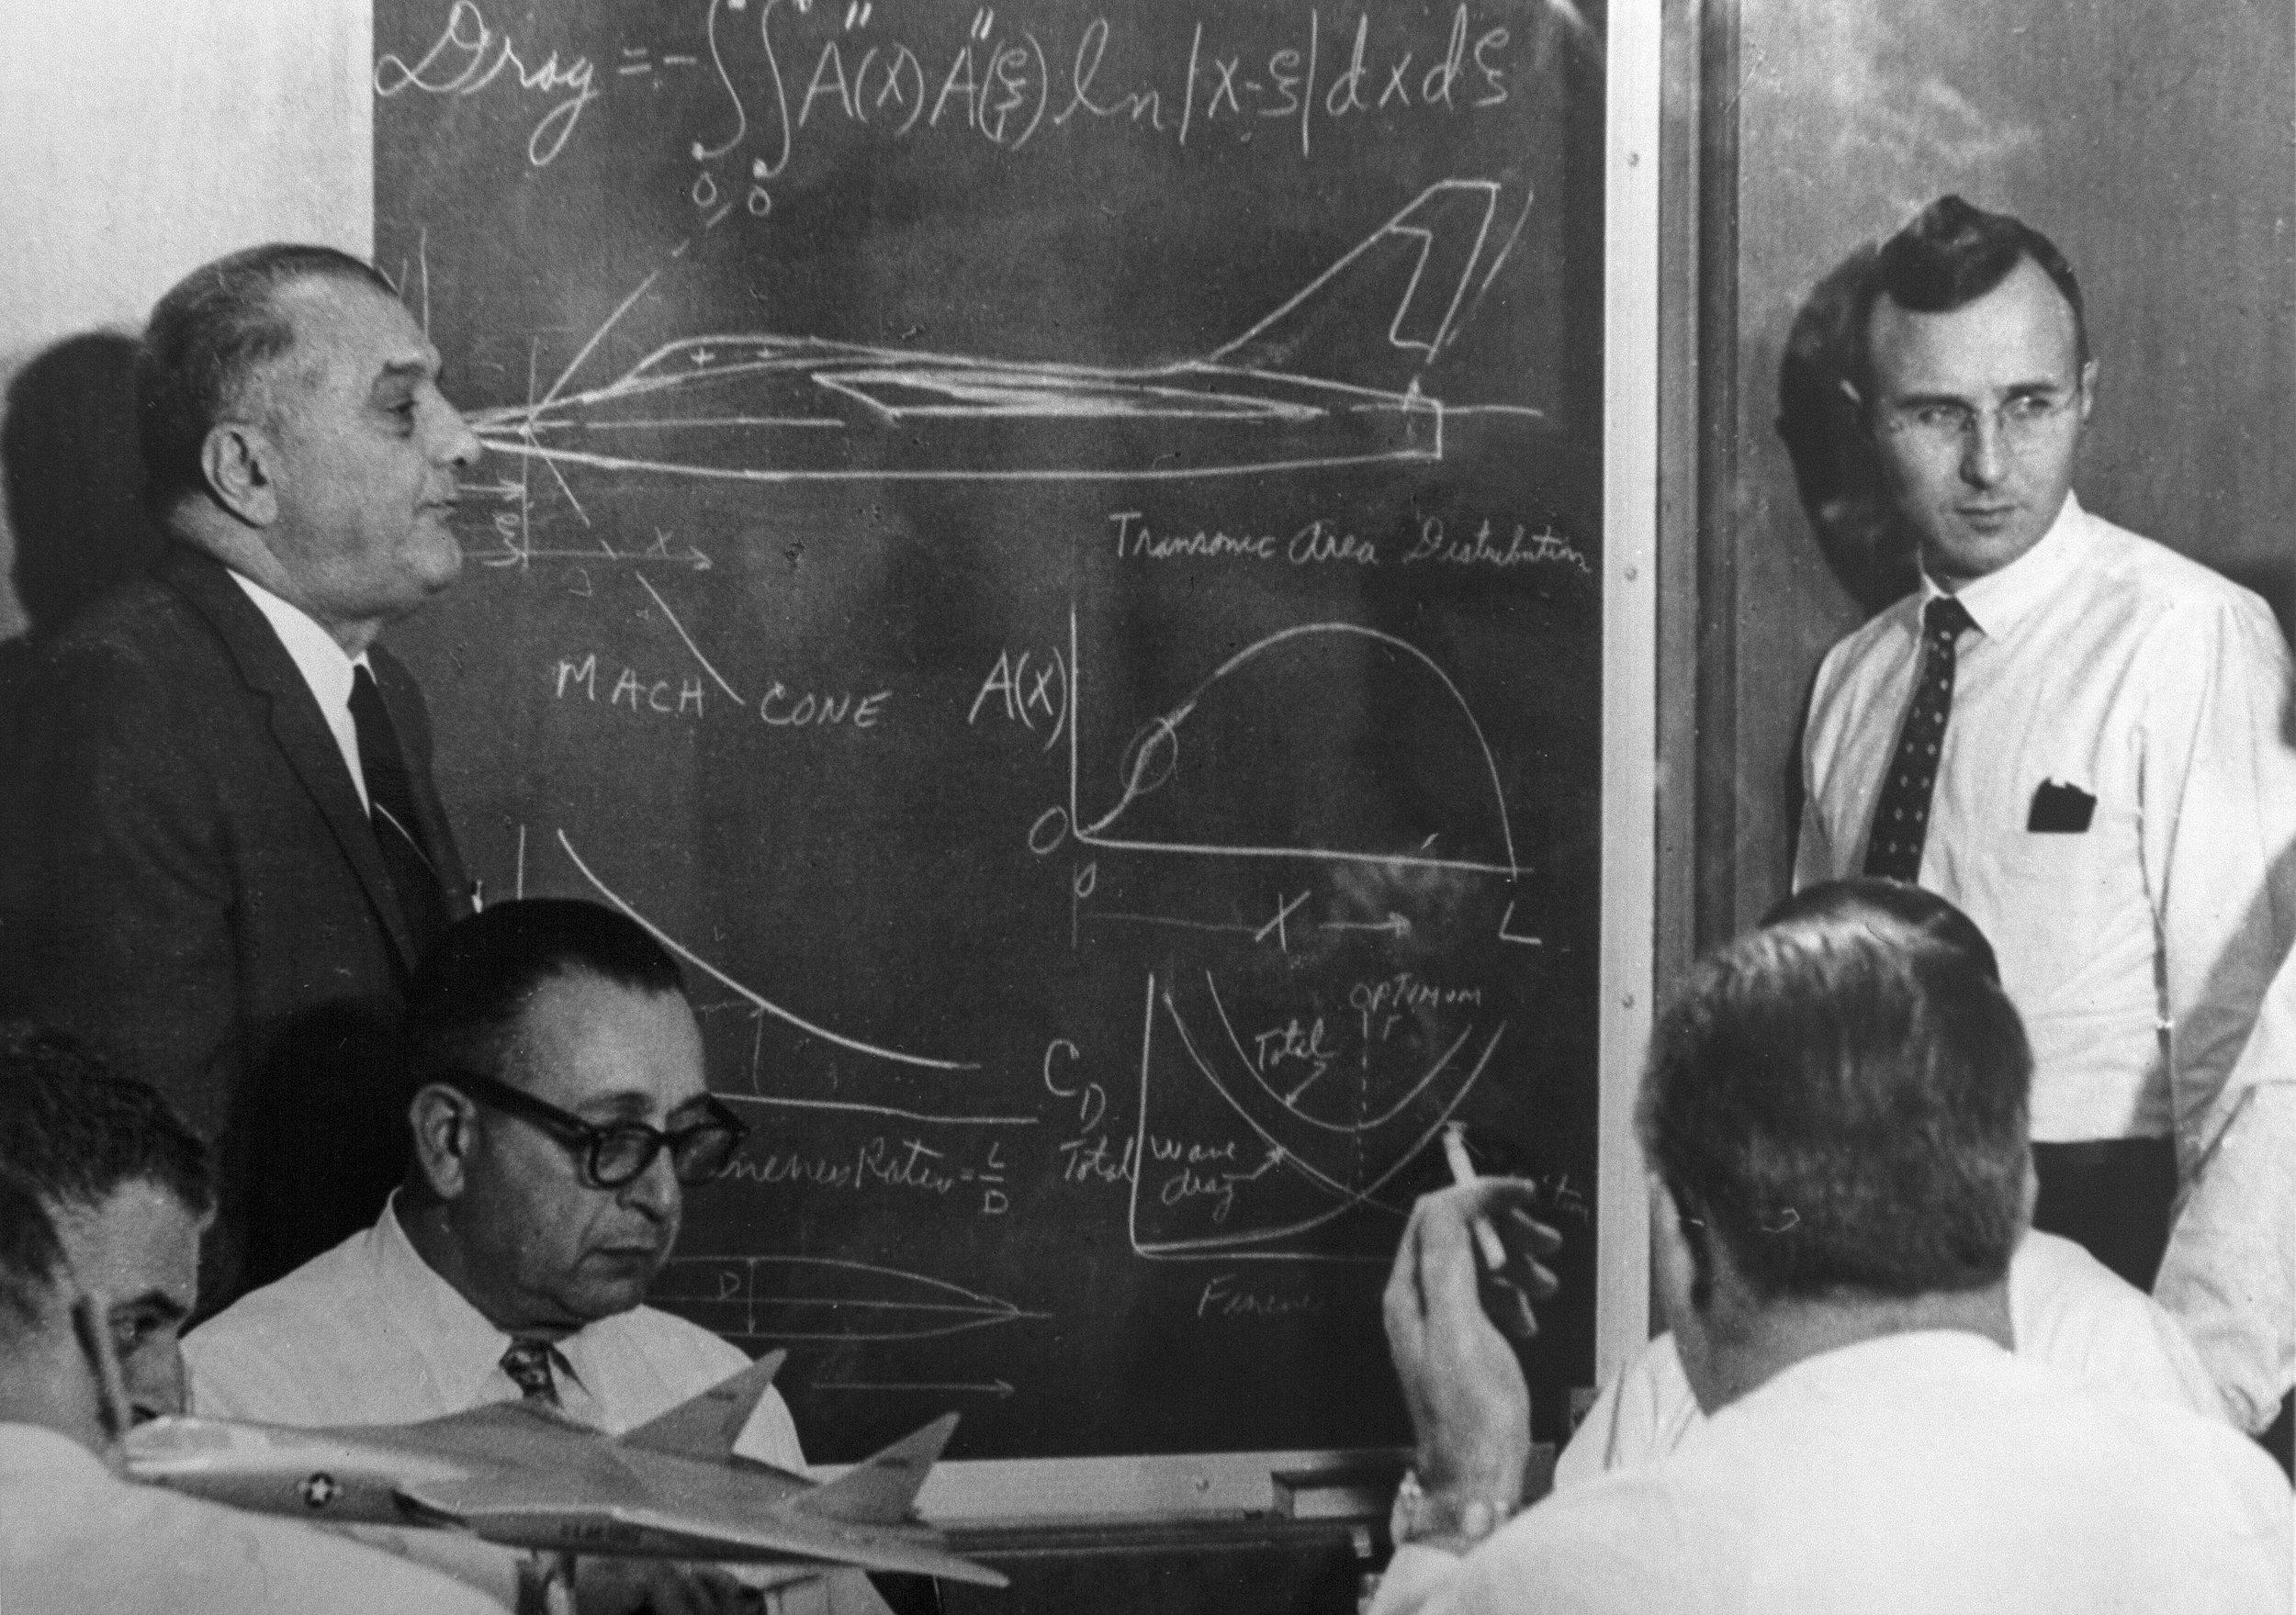 Kartveli (standing left) illustrates his aviation designs